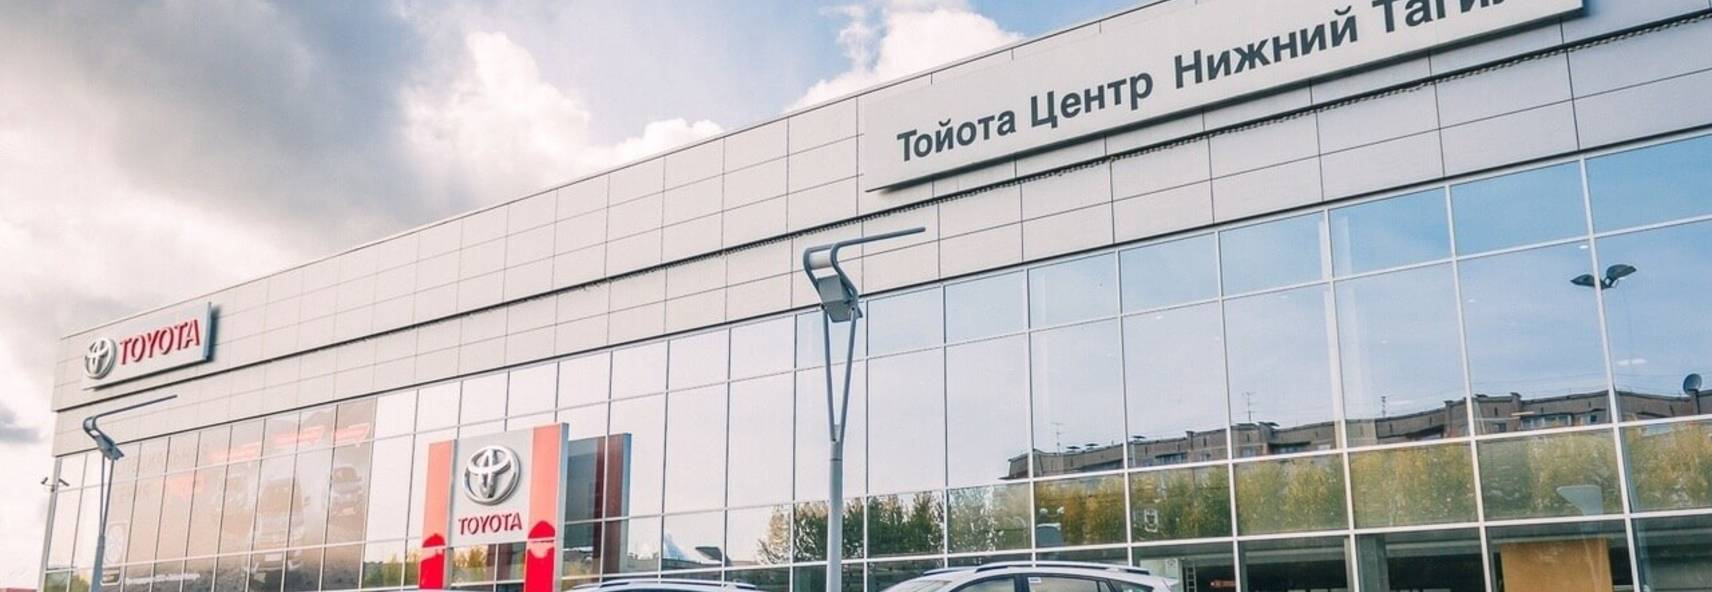 Тойота Центр Нижний Тагил